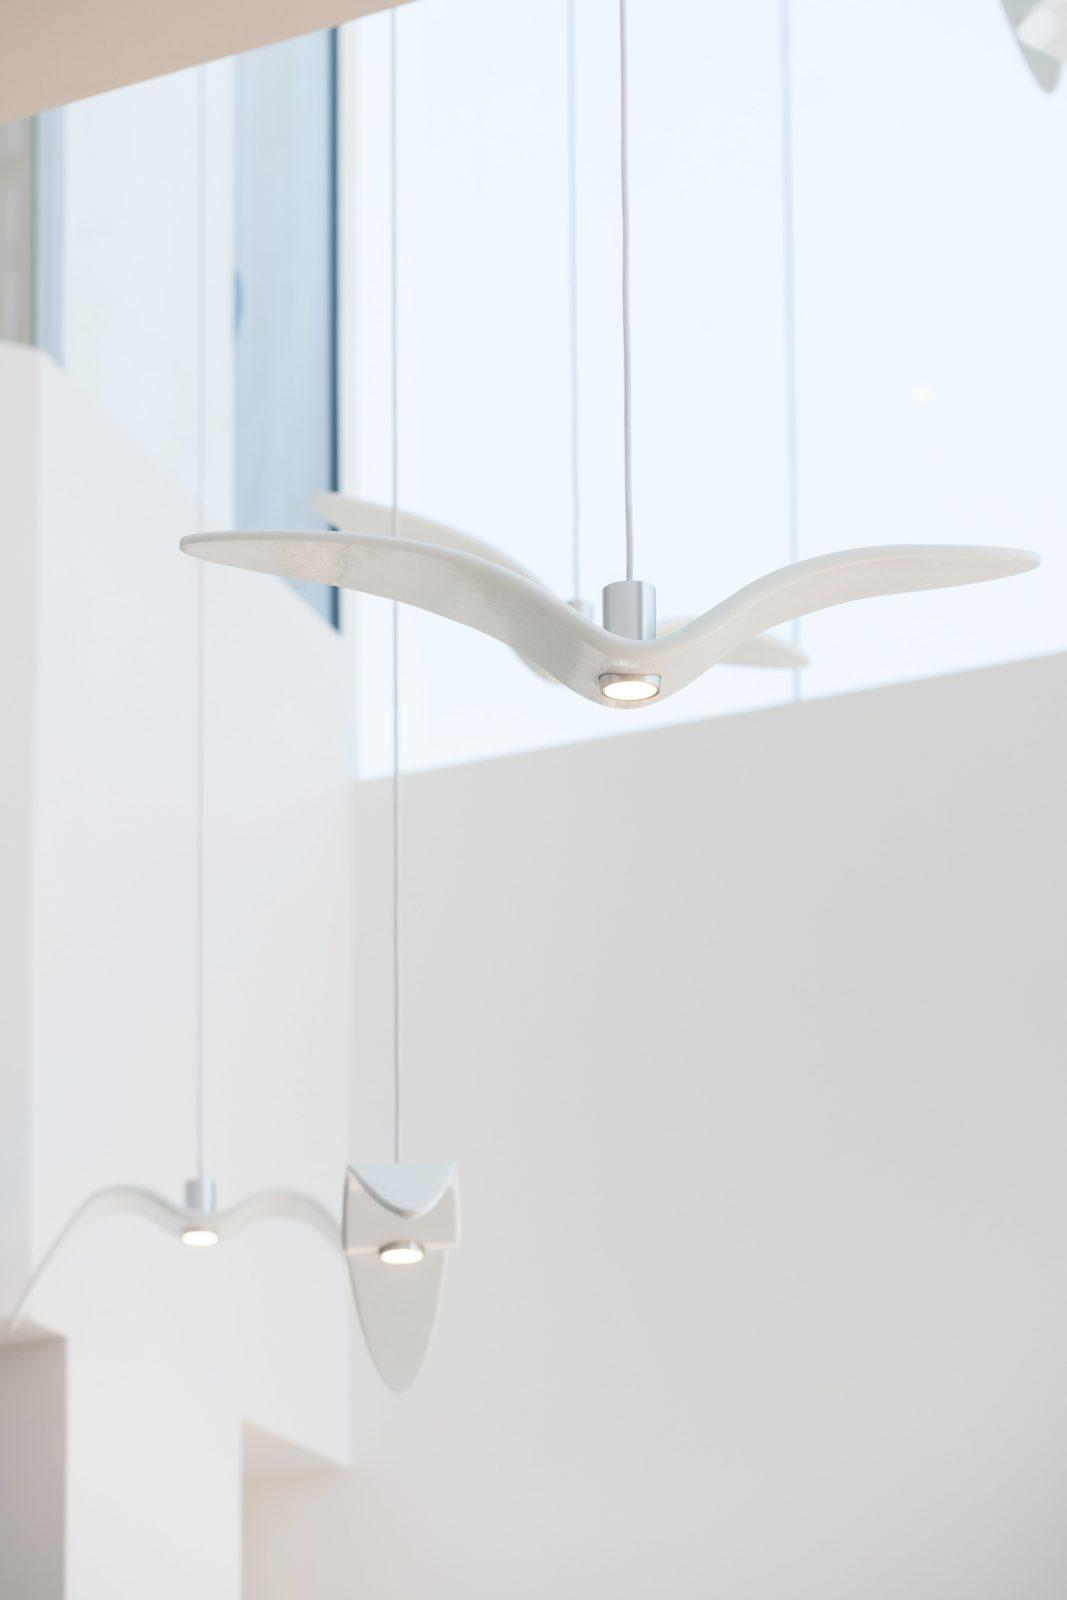 Restaurante para niños White and The bear. Dubai. Interiorismo minimalista. Lámparas con forma de pájaro